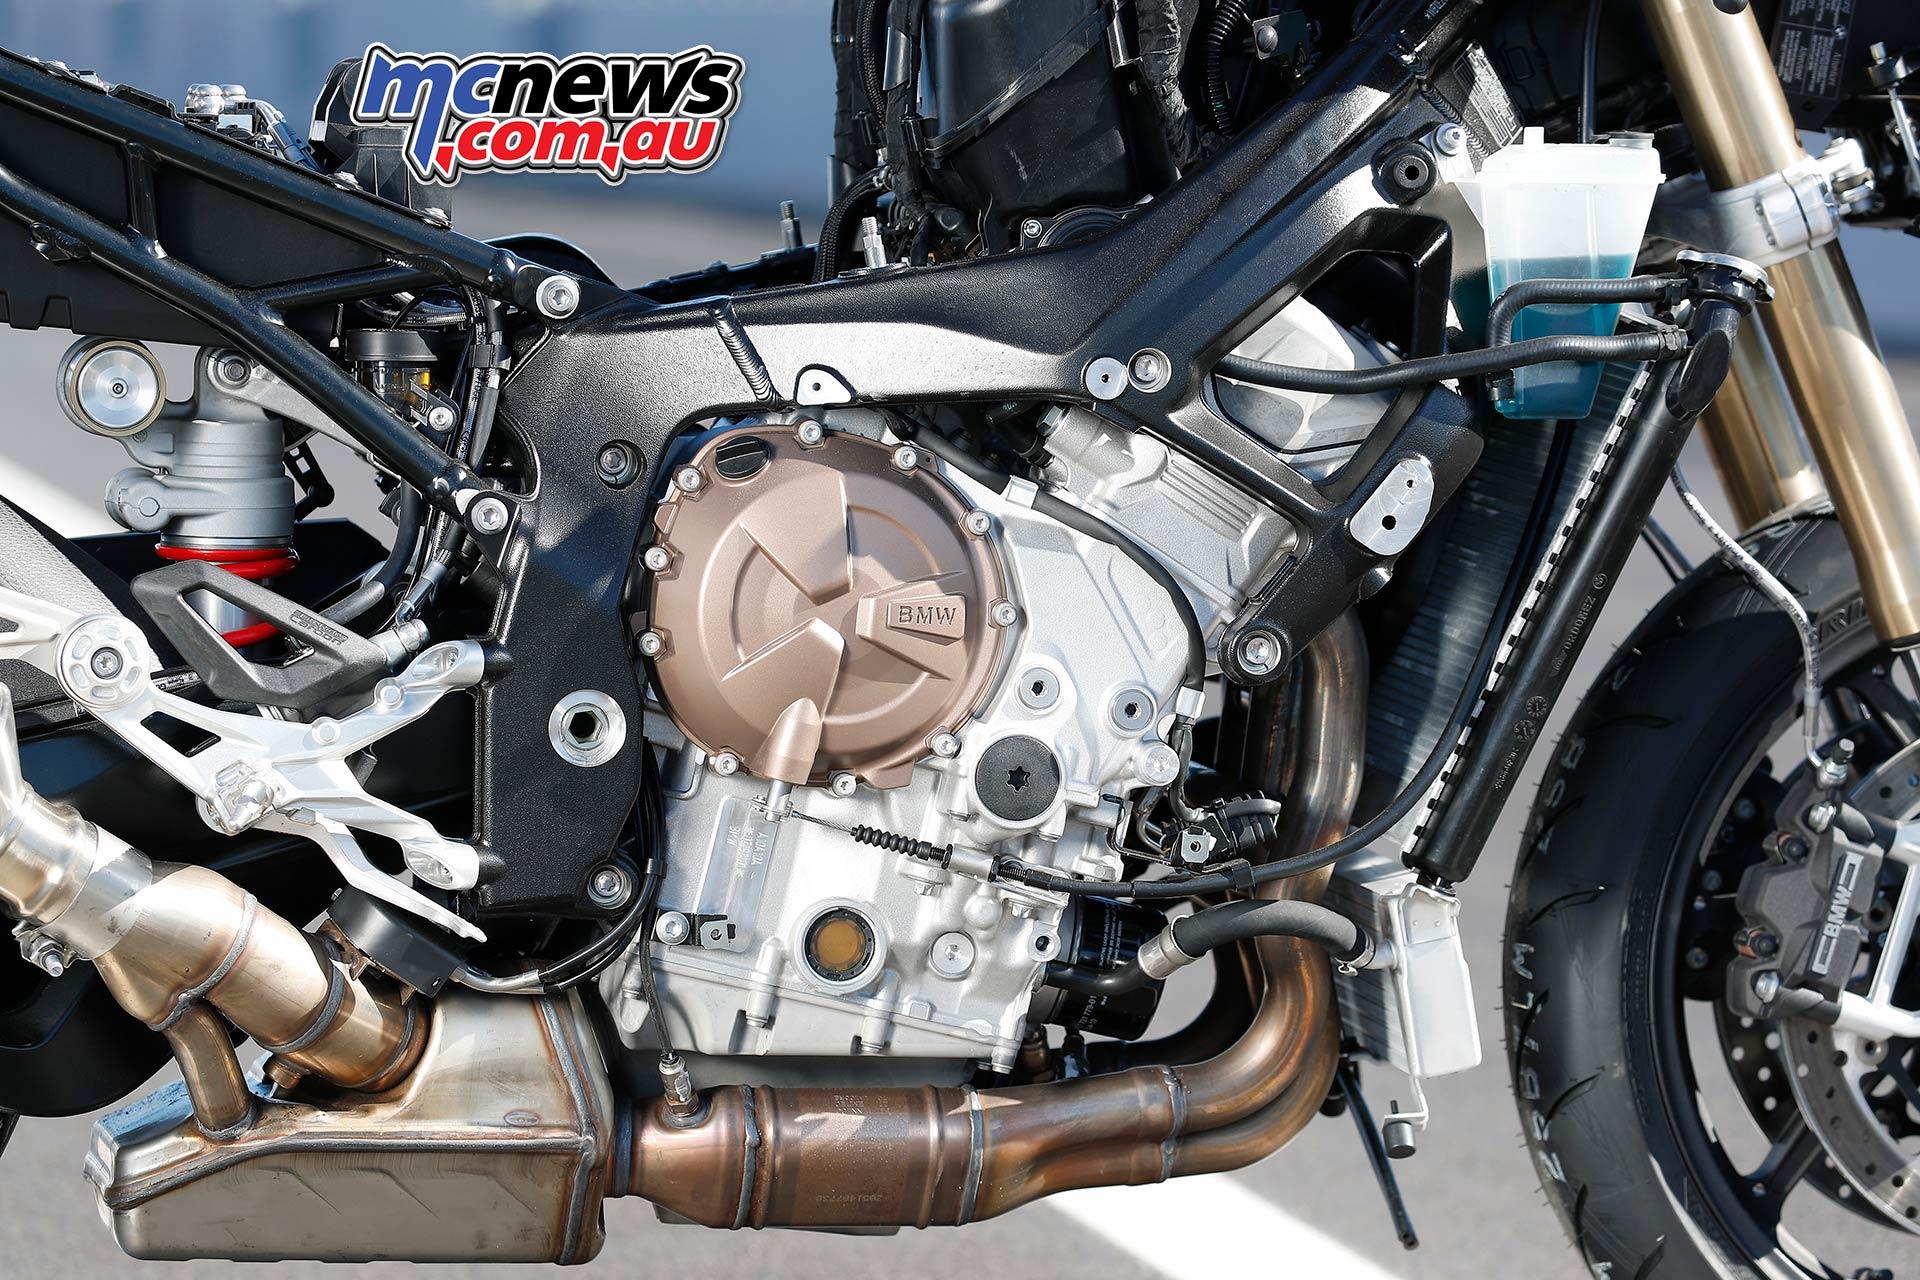 BMW SRR Engine Cat PreMuffler Details